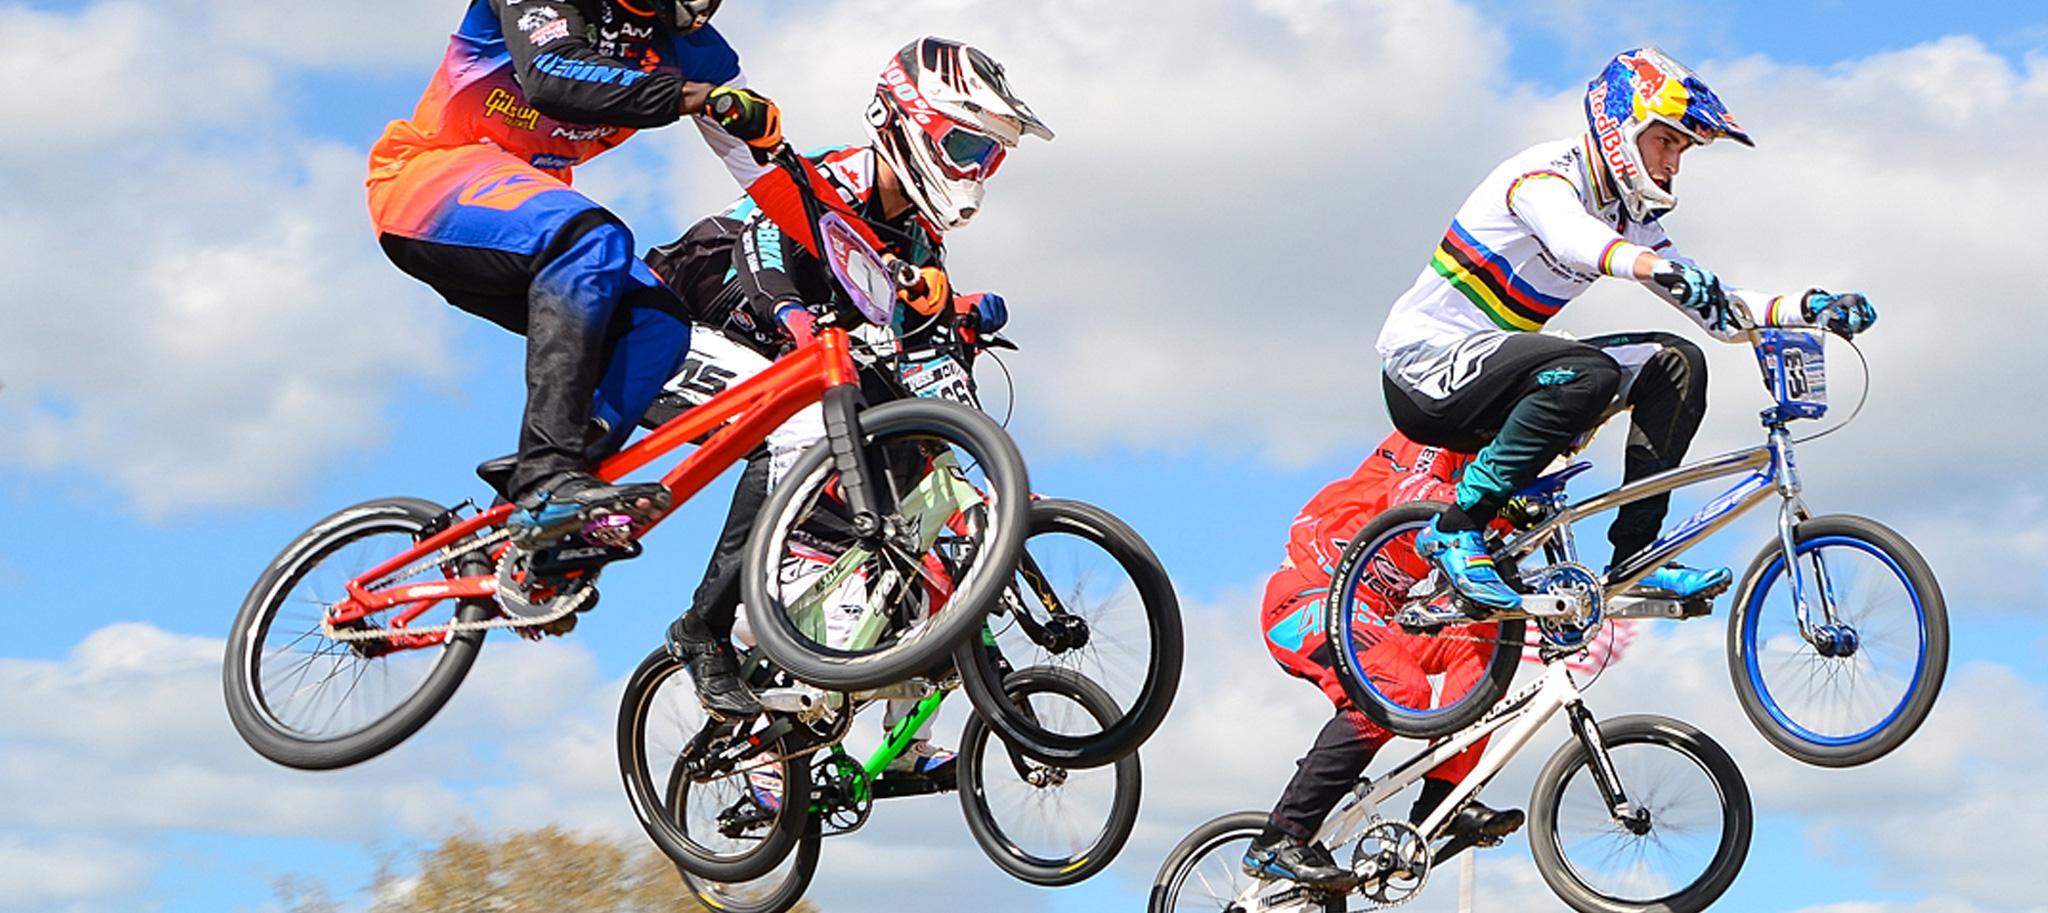 Joris Daudet – 2016 USA BMX #1 Pro and UCI BMX World Champion Profile